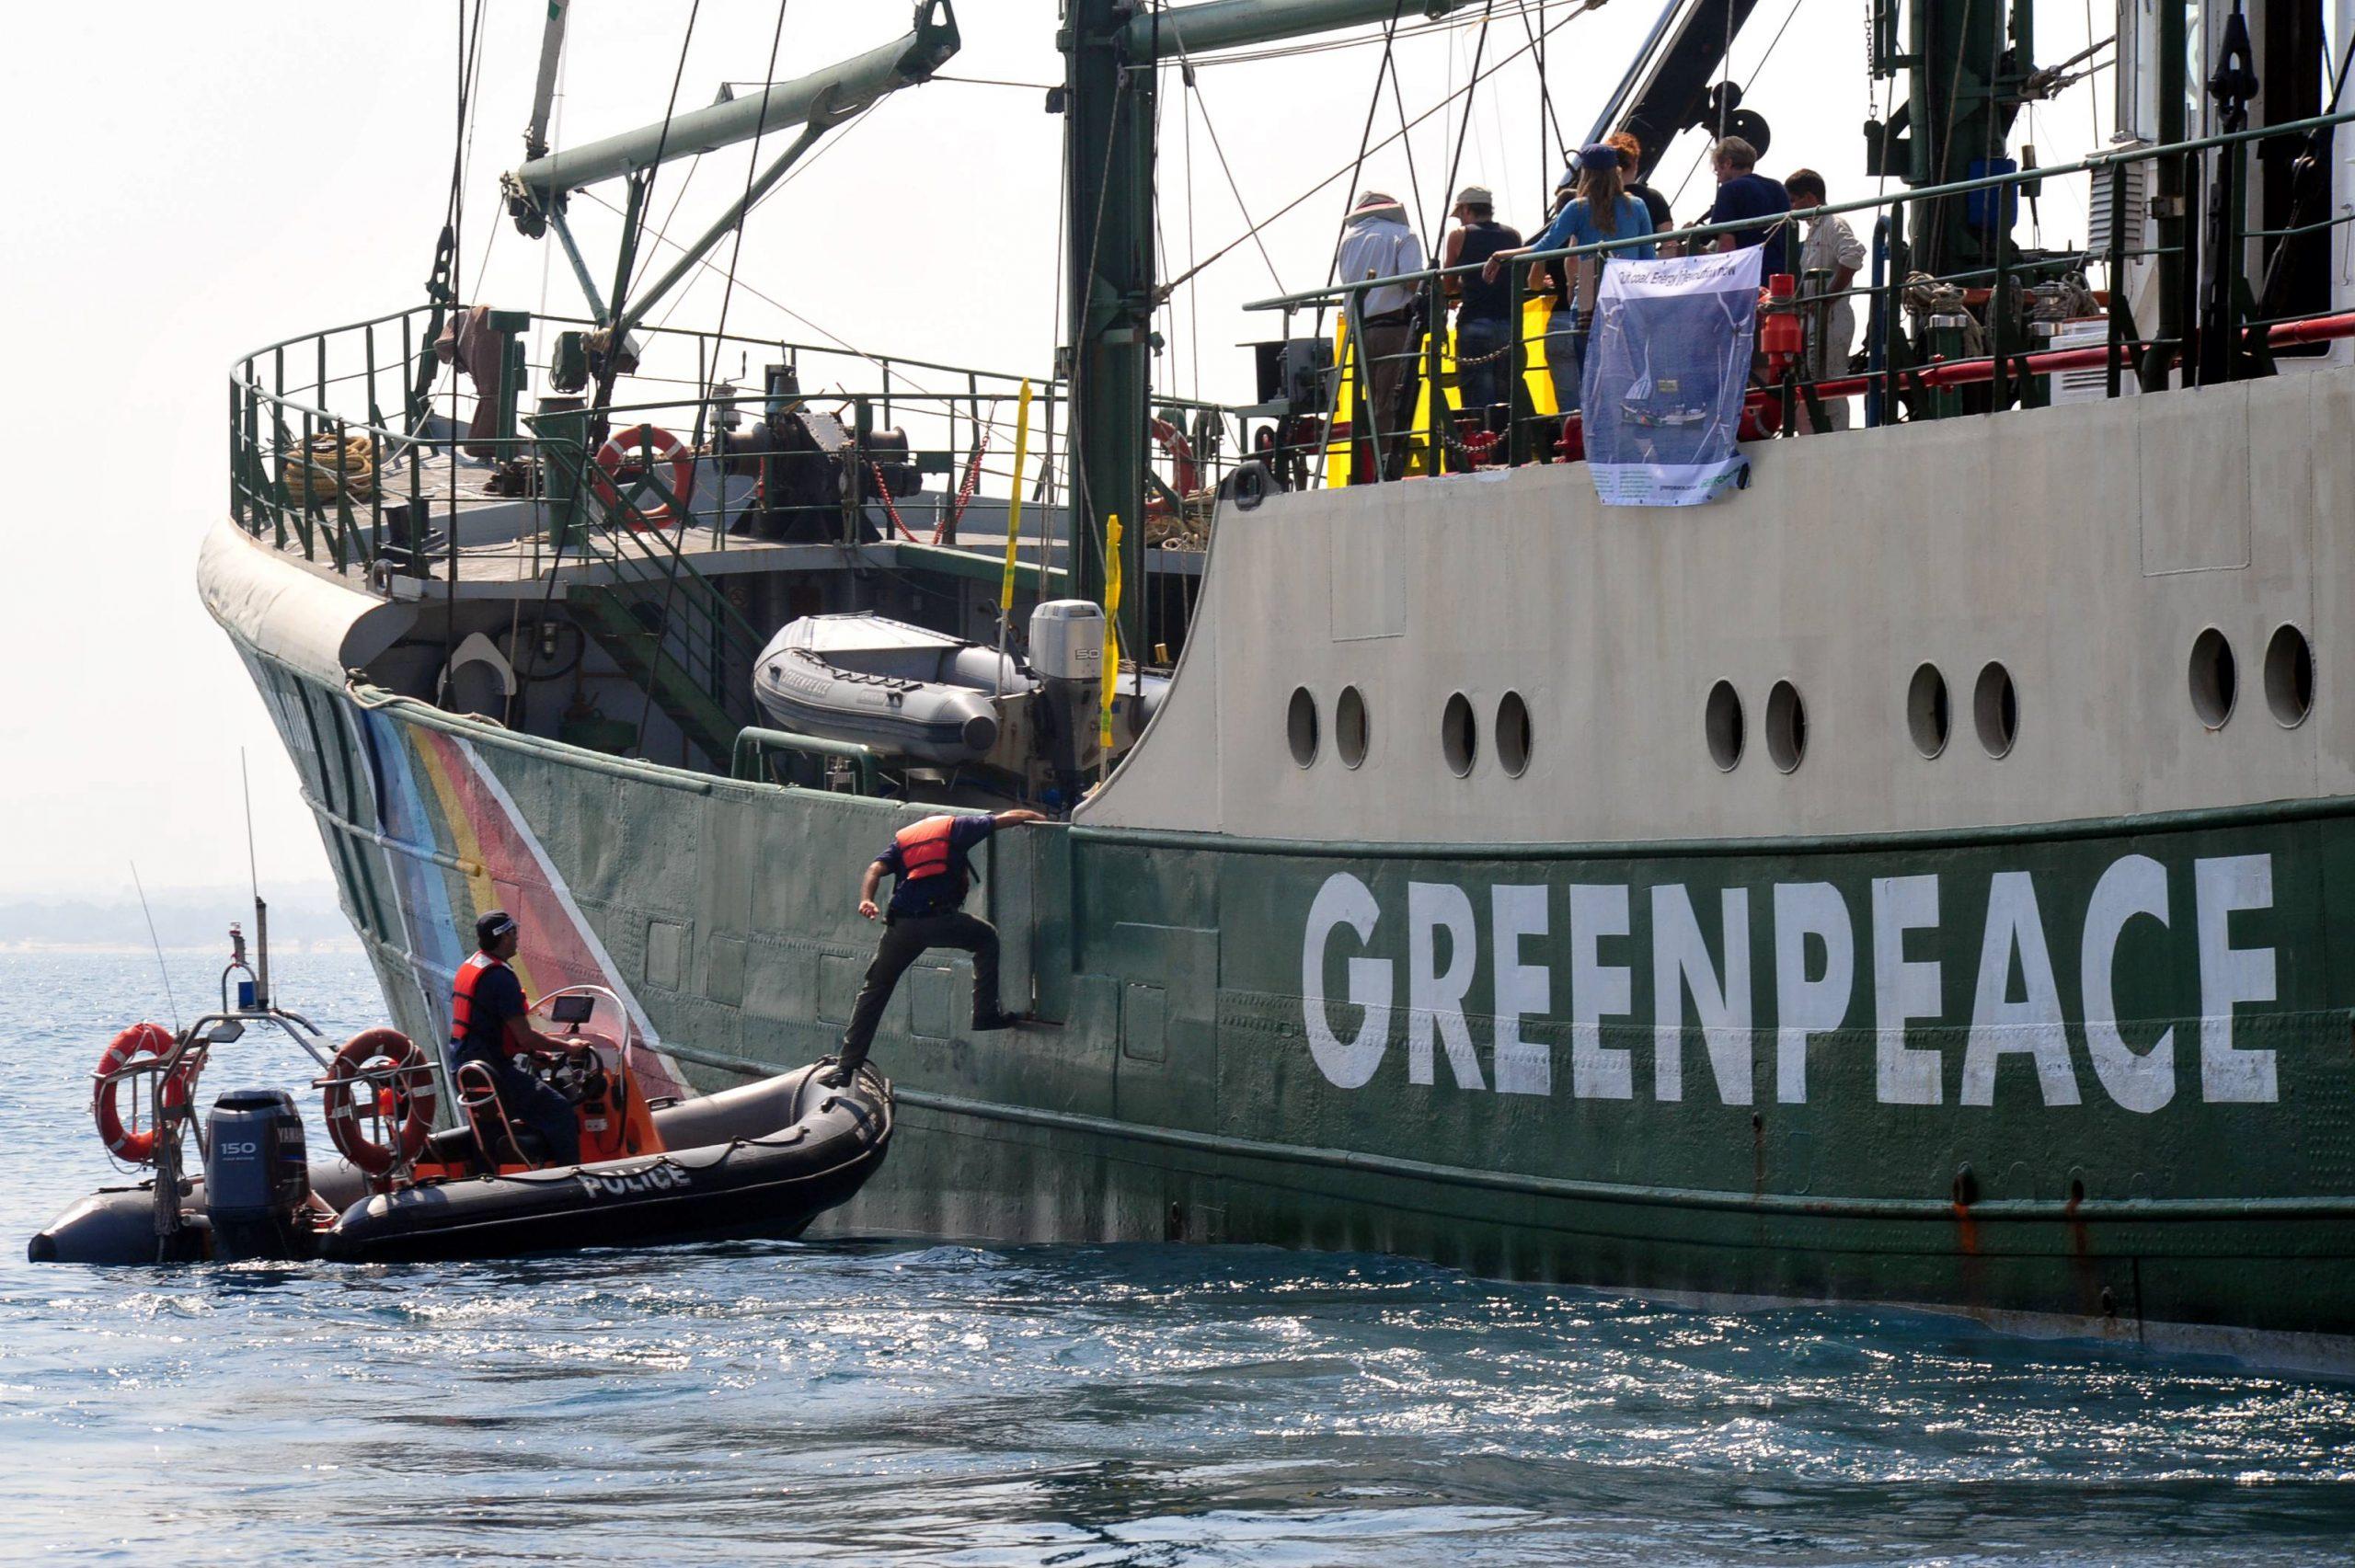 Greenpeace lowers member into water